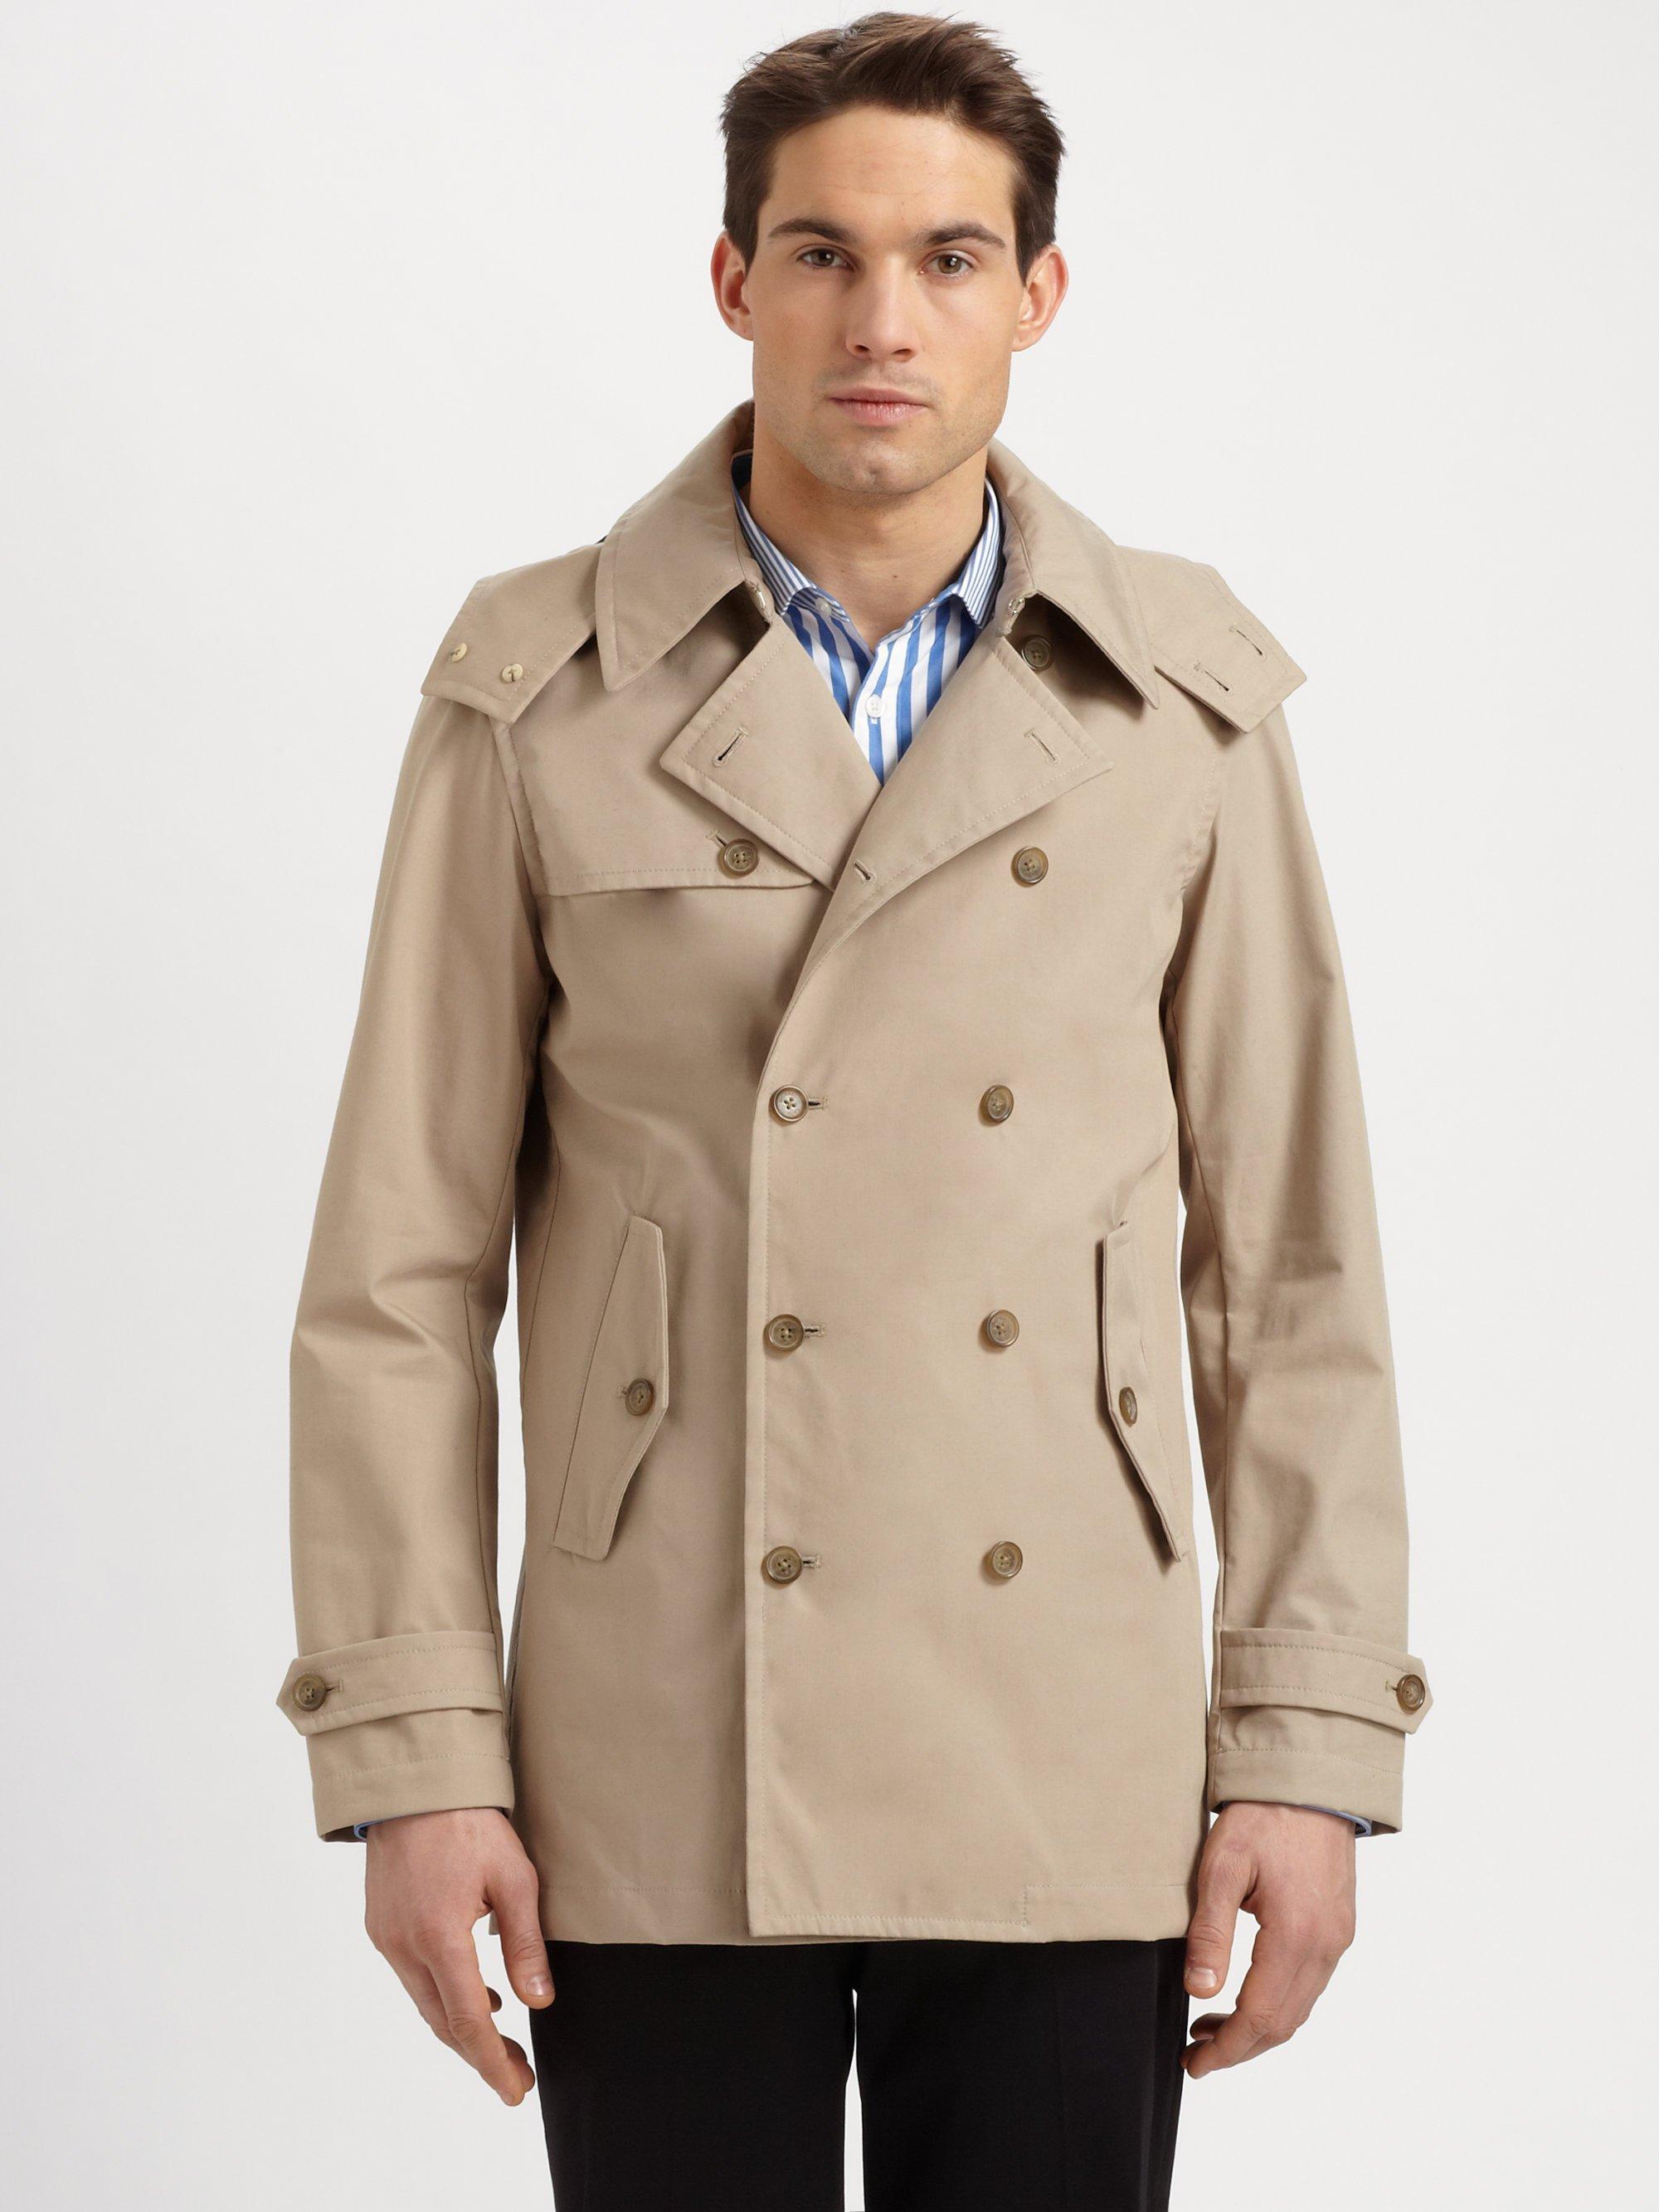 Michael kors Hooded Trenchcoat in Natural for Men | Lyst